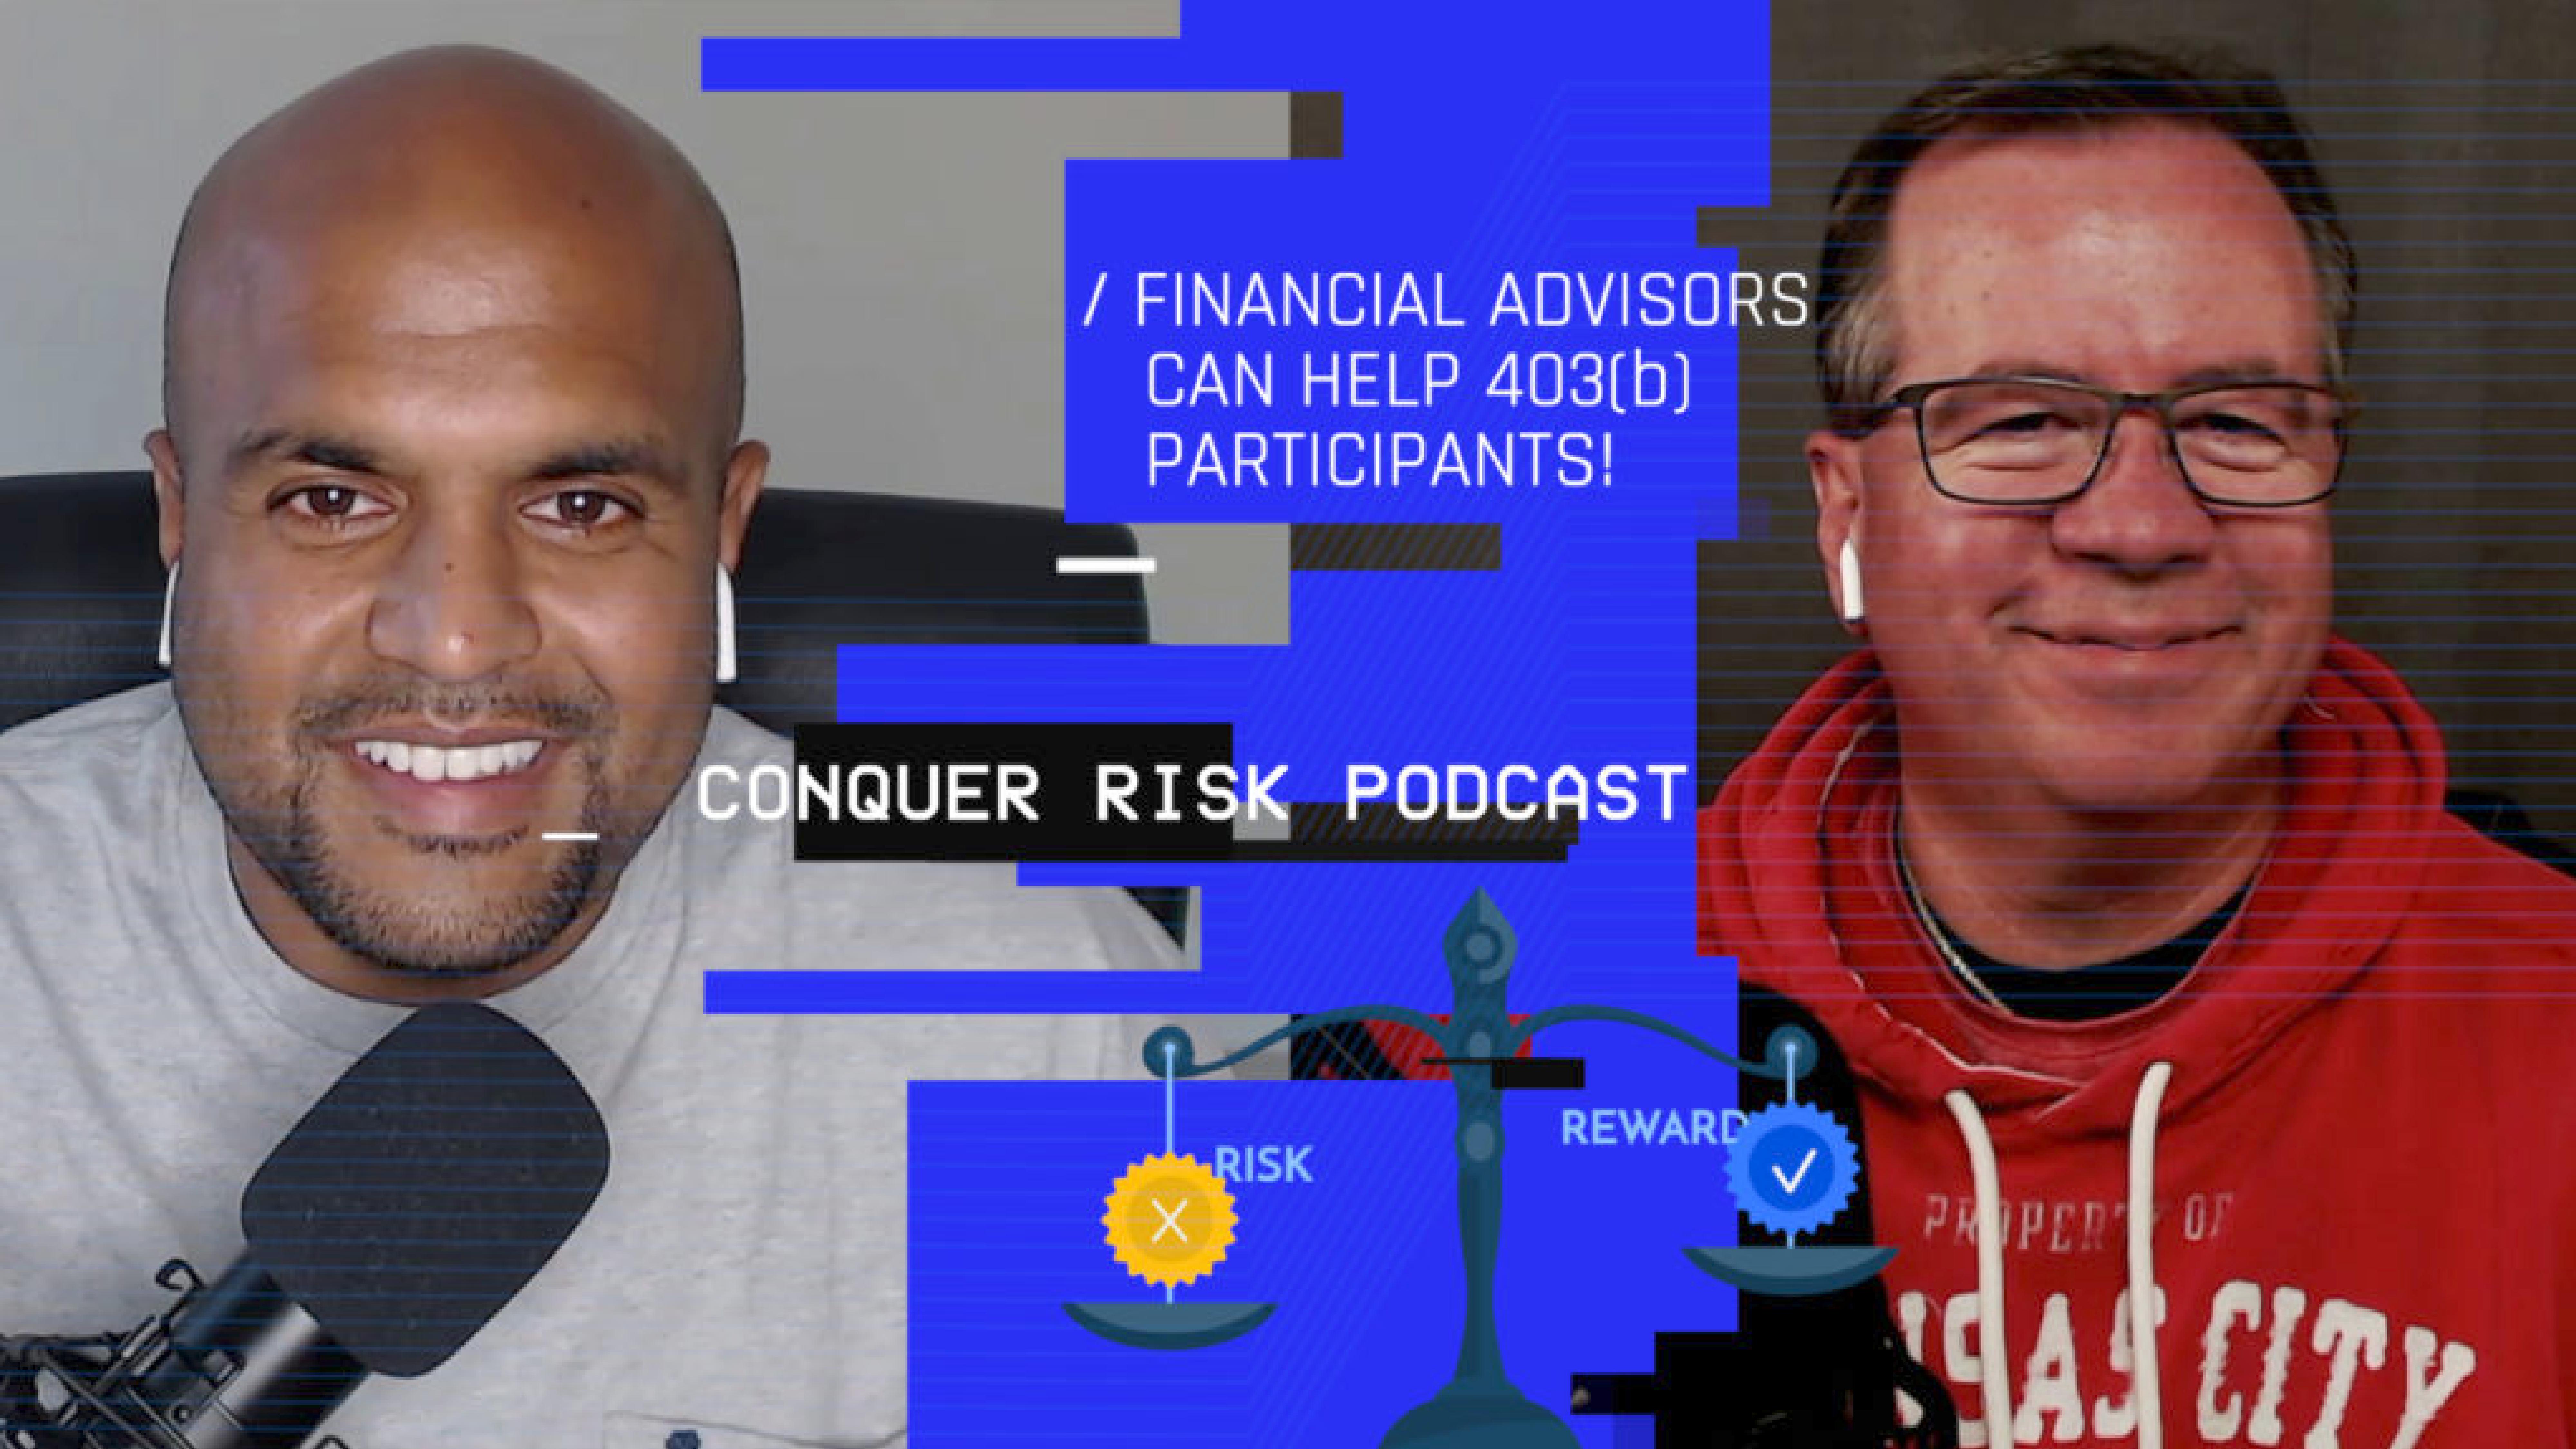 Financial Advisors Can Help 403(b) Participants! (S1 E8)